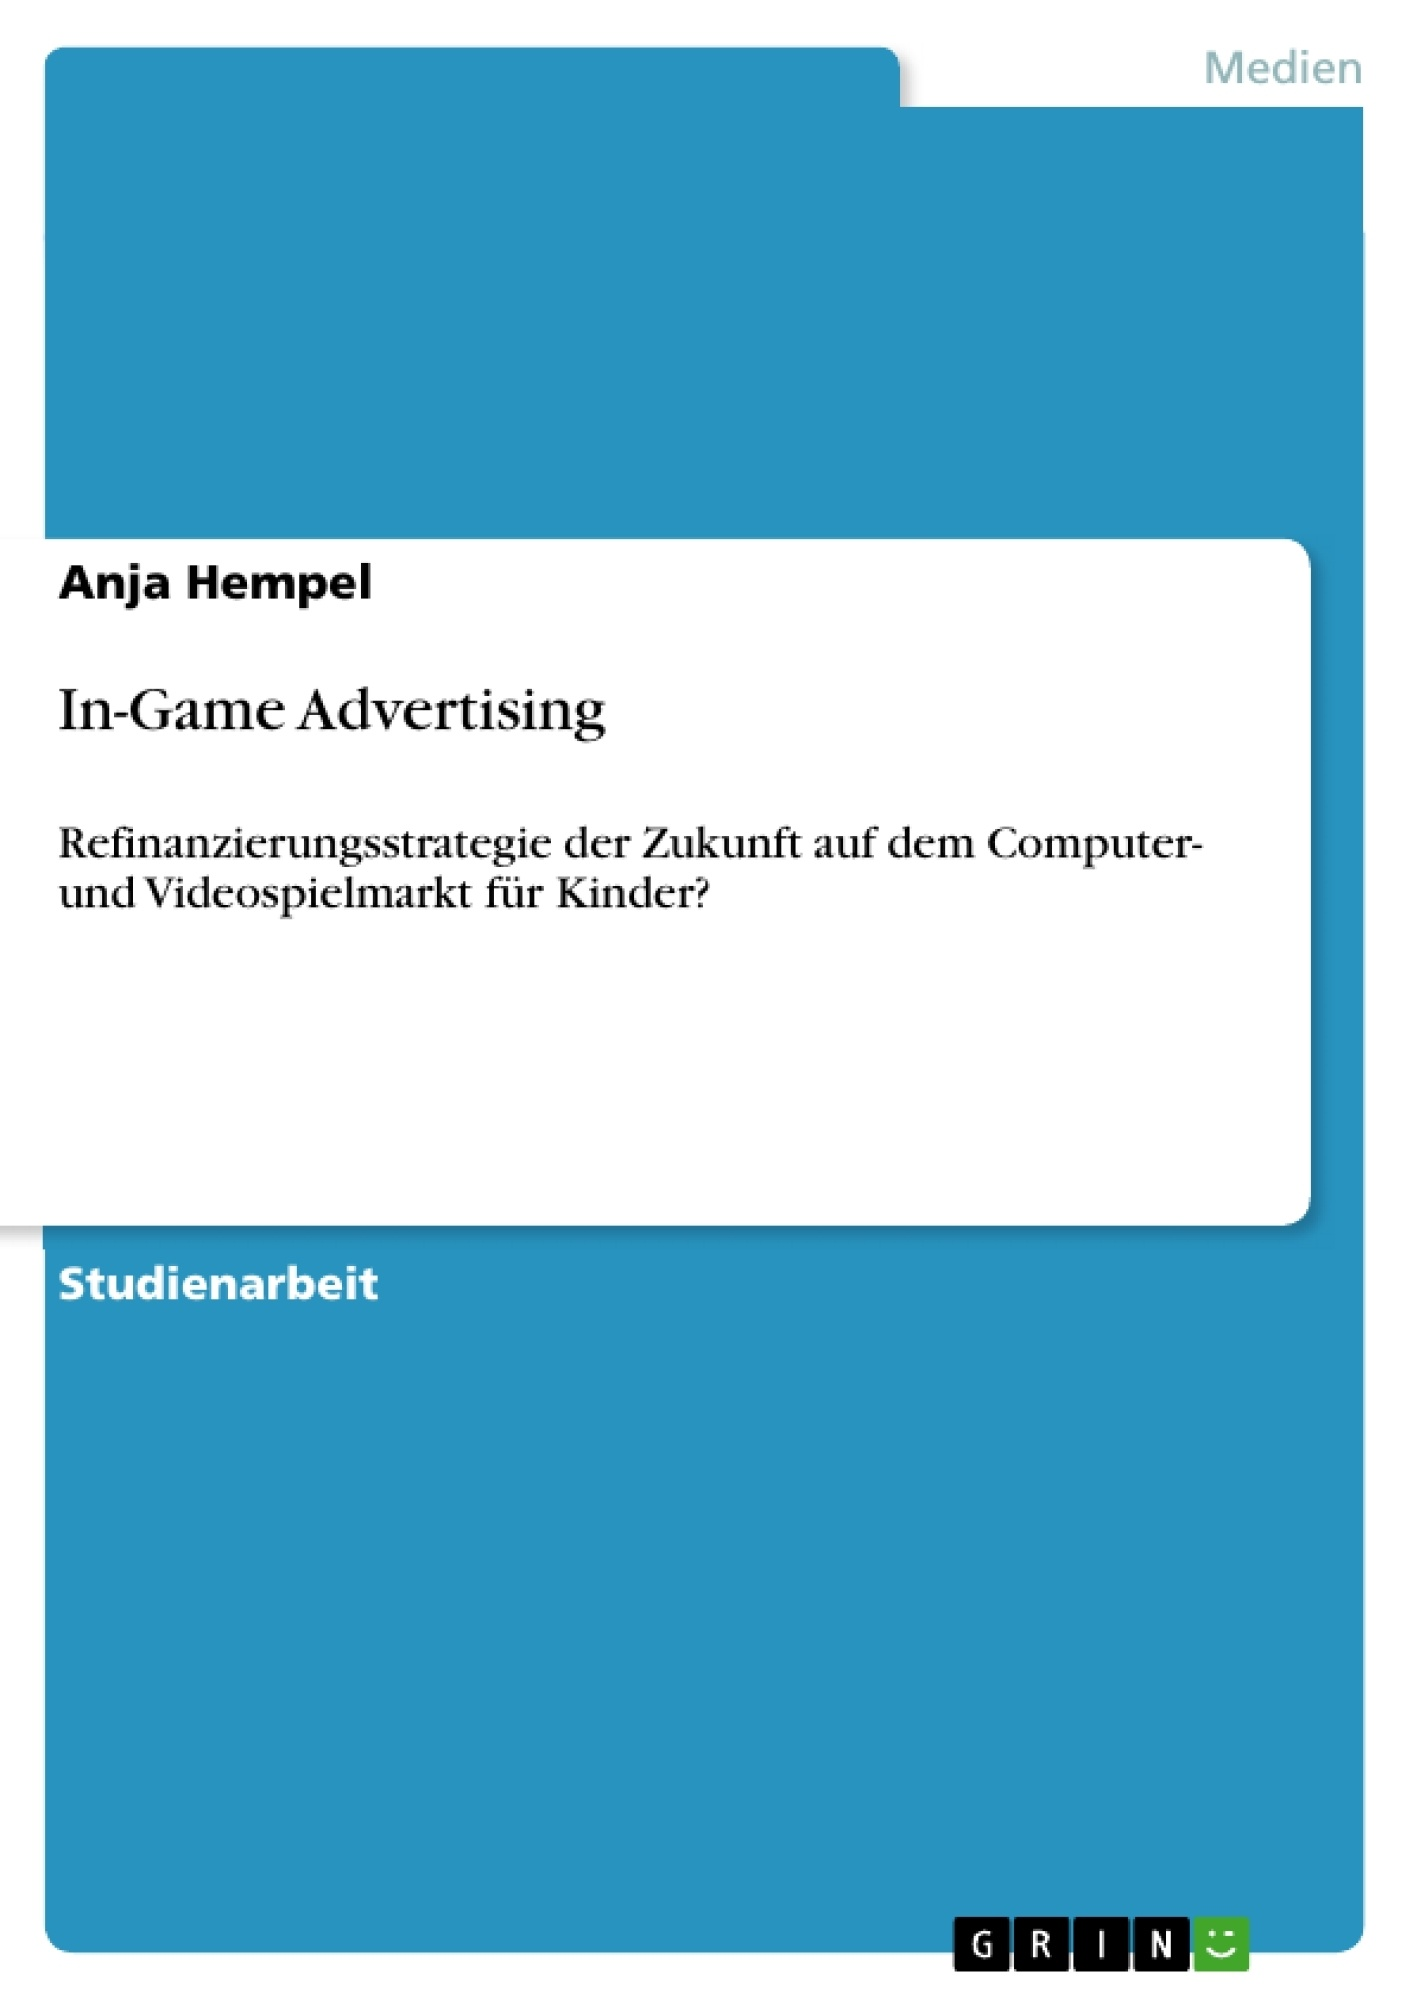 Titel: In-Game Advertising